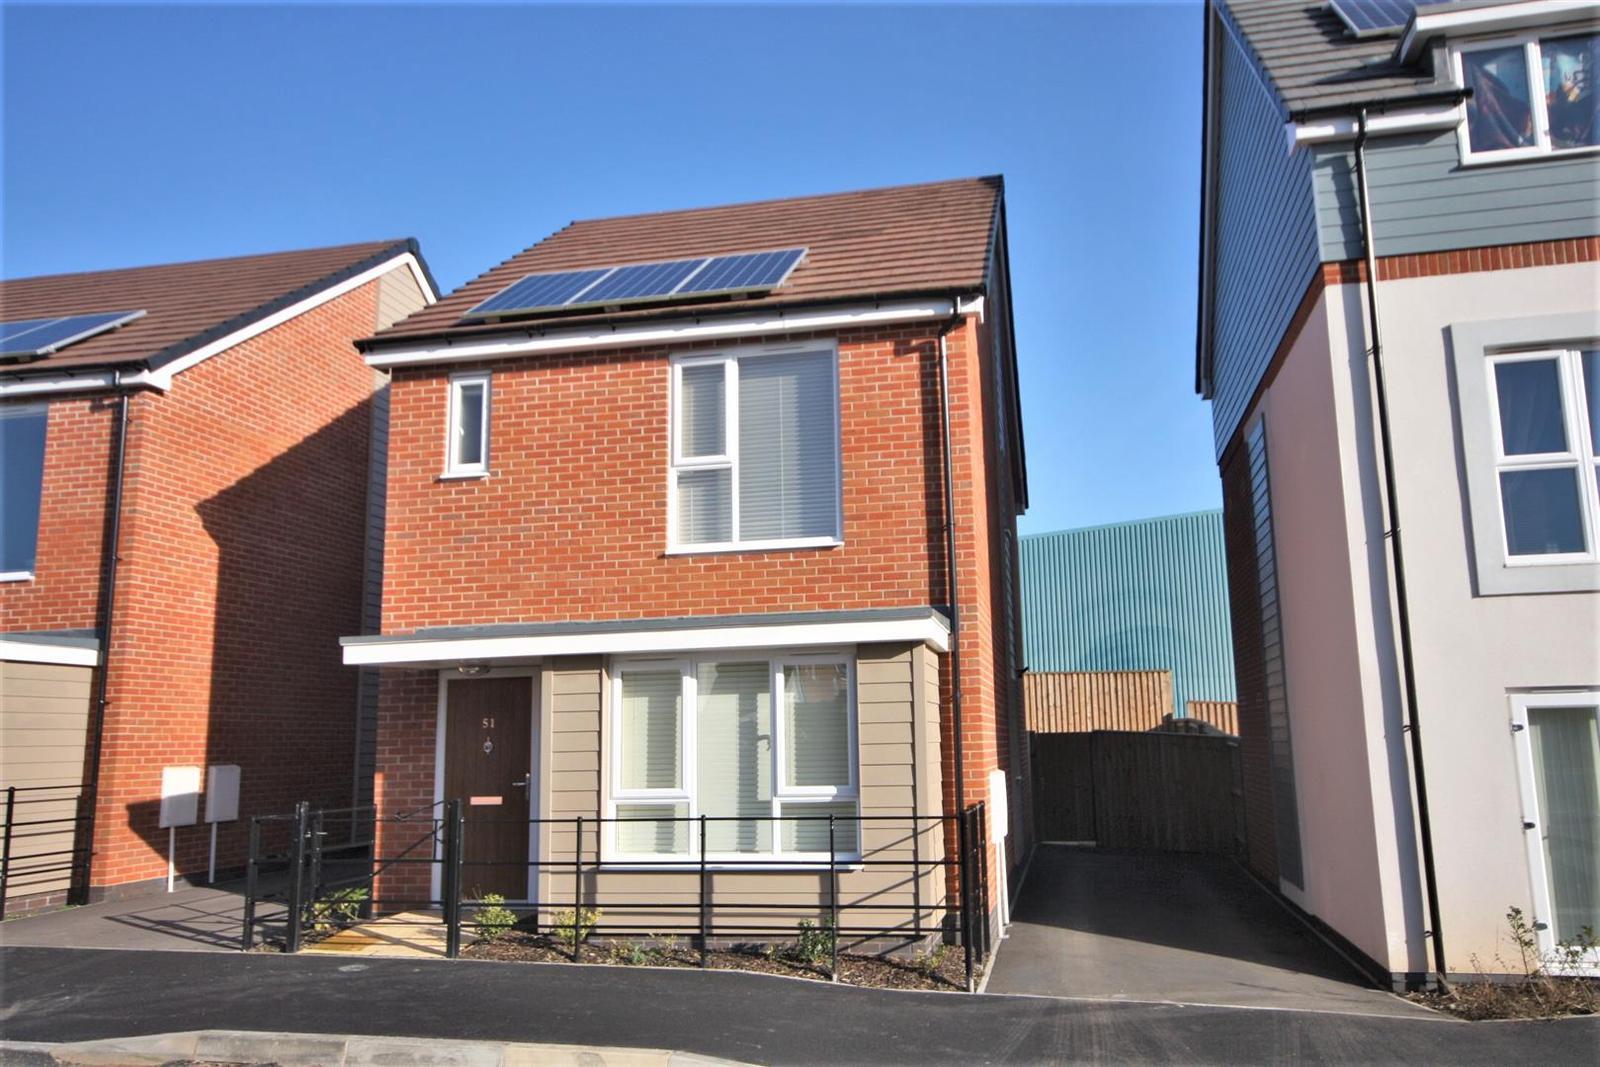 3 Bedrooms Property for sale in Buckthorn Road, Coalville